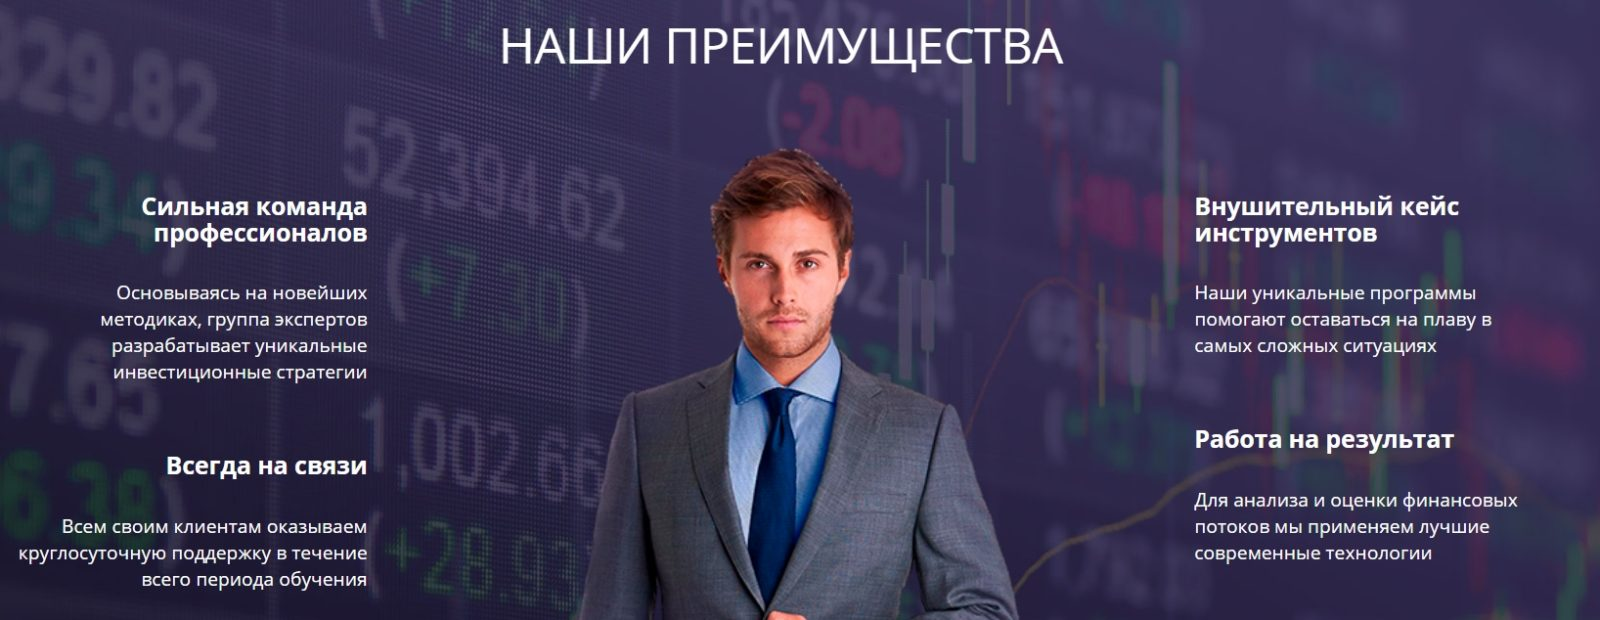 Преимущества компании Банкор